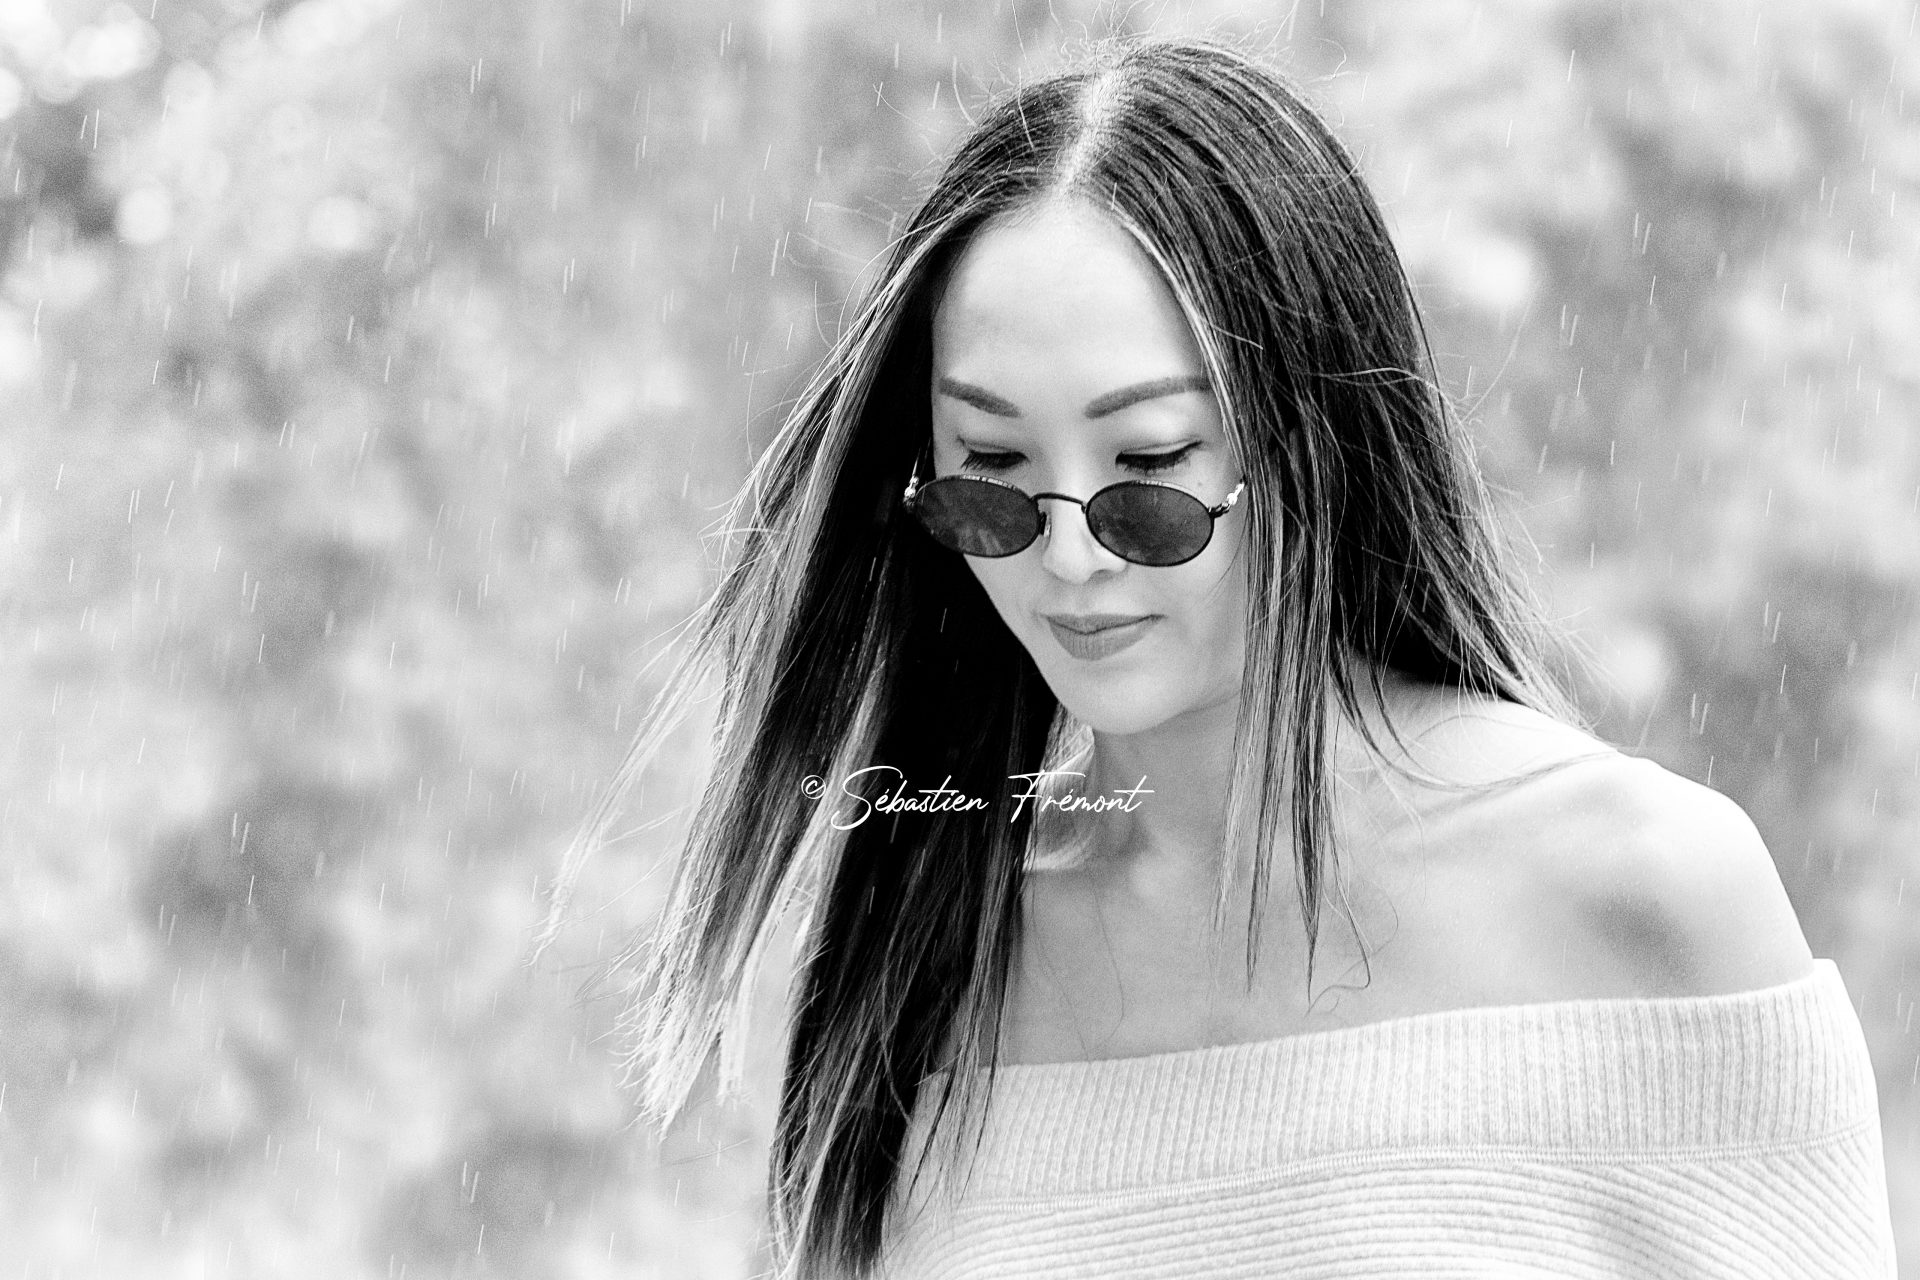 French Photographer Portrait Photography / Chriselle Lim